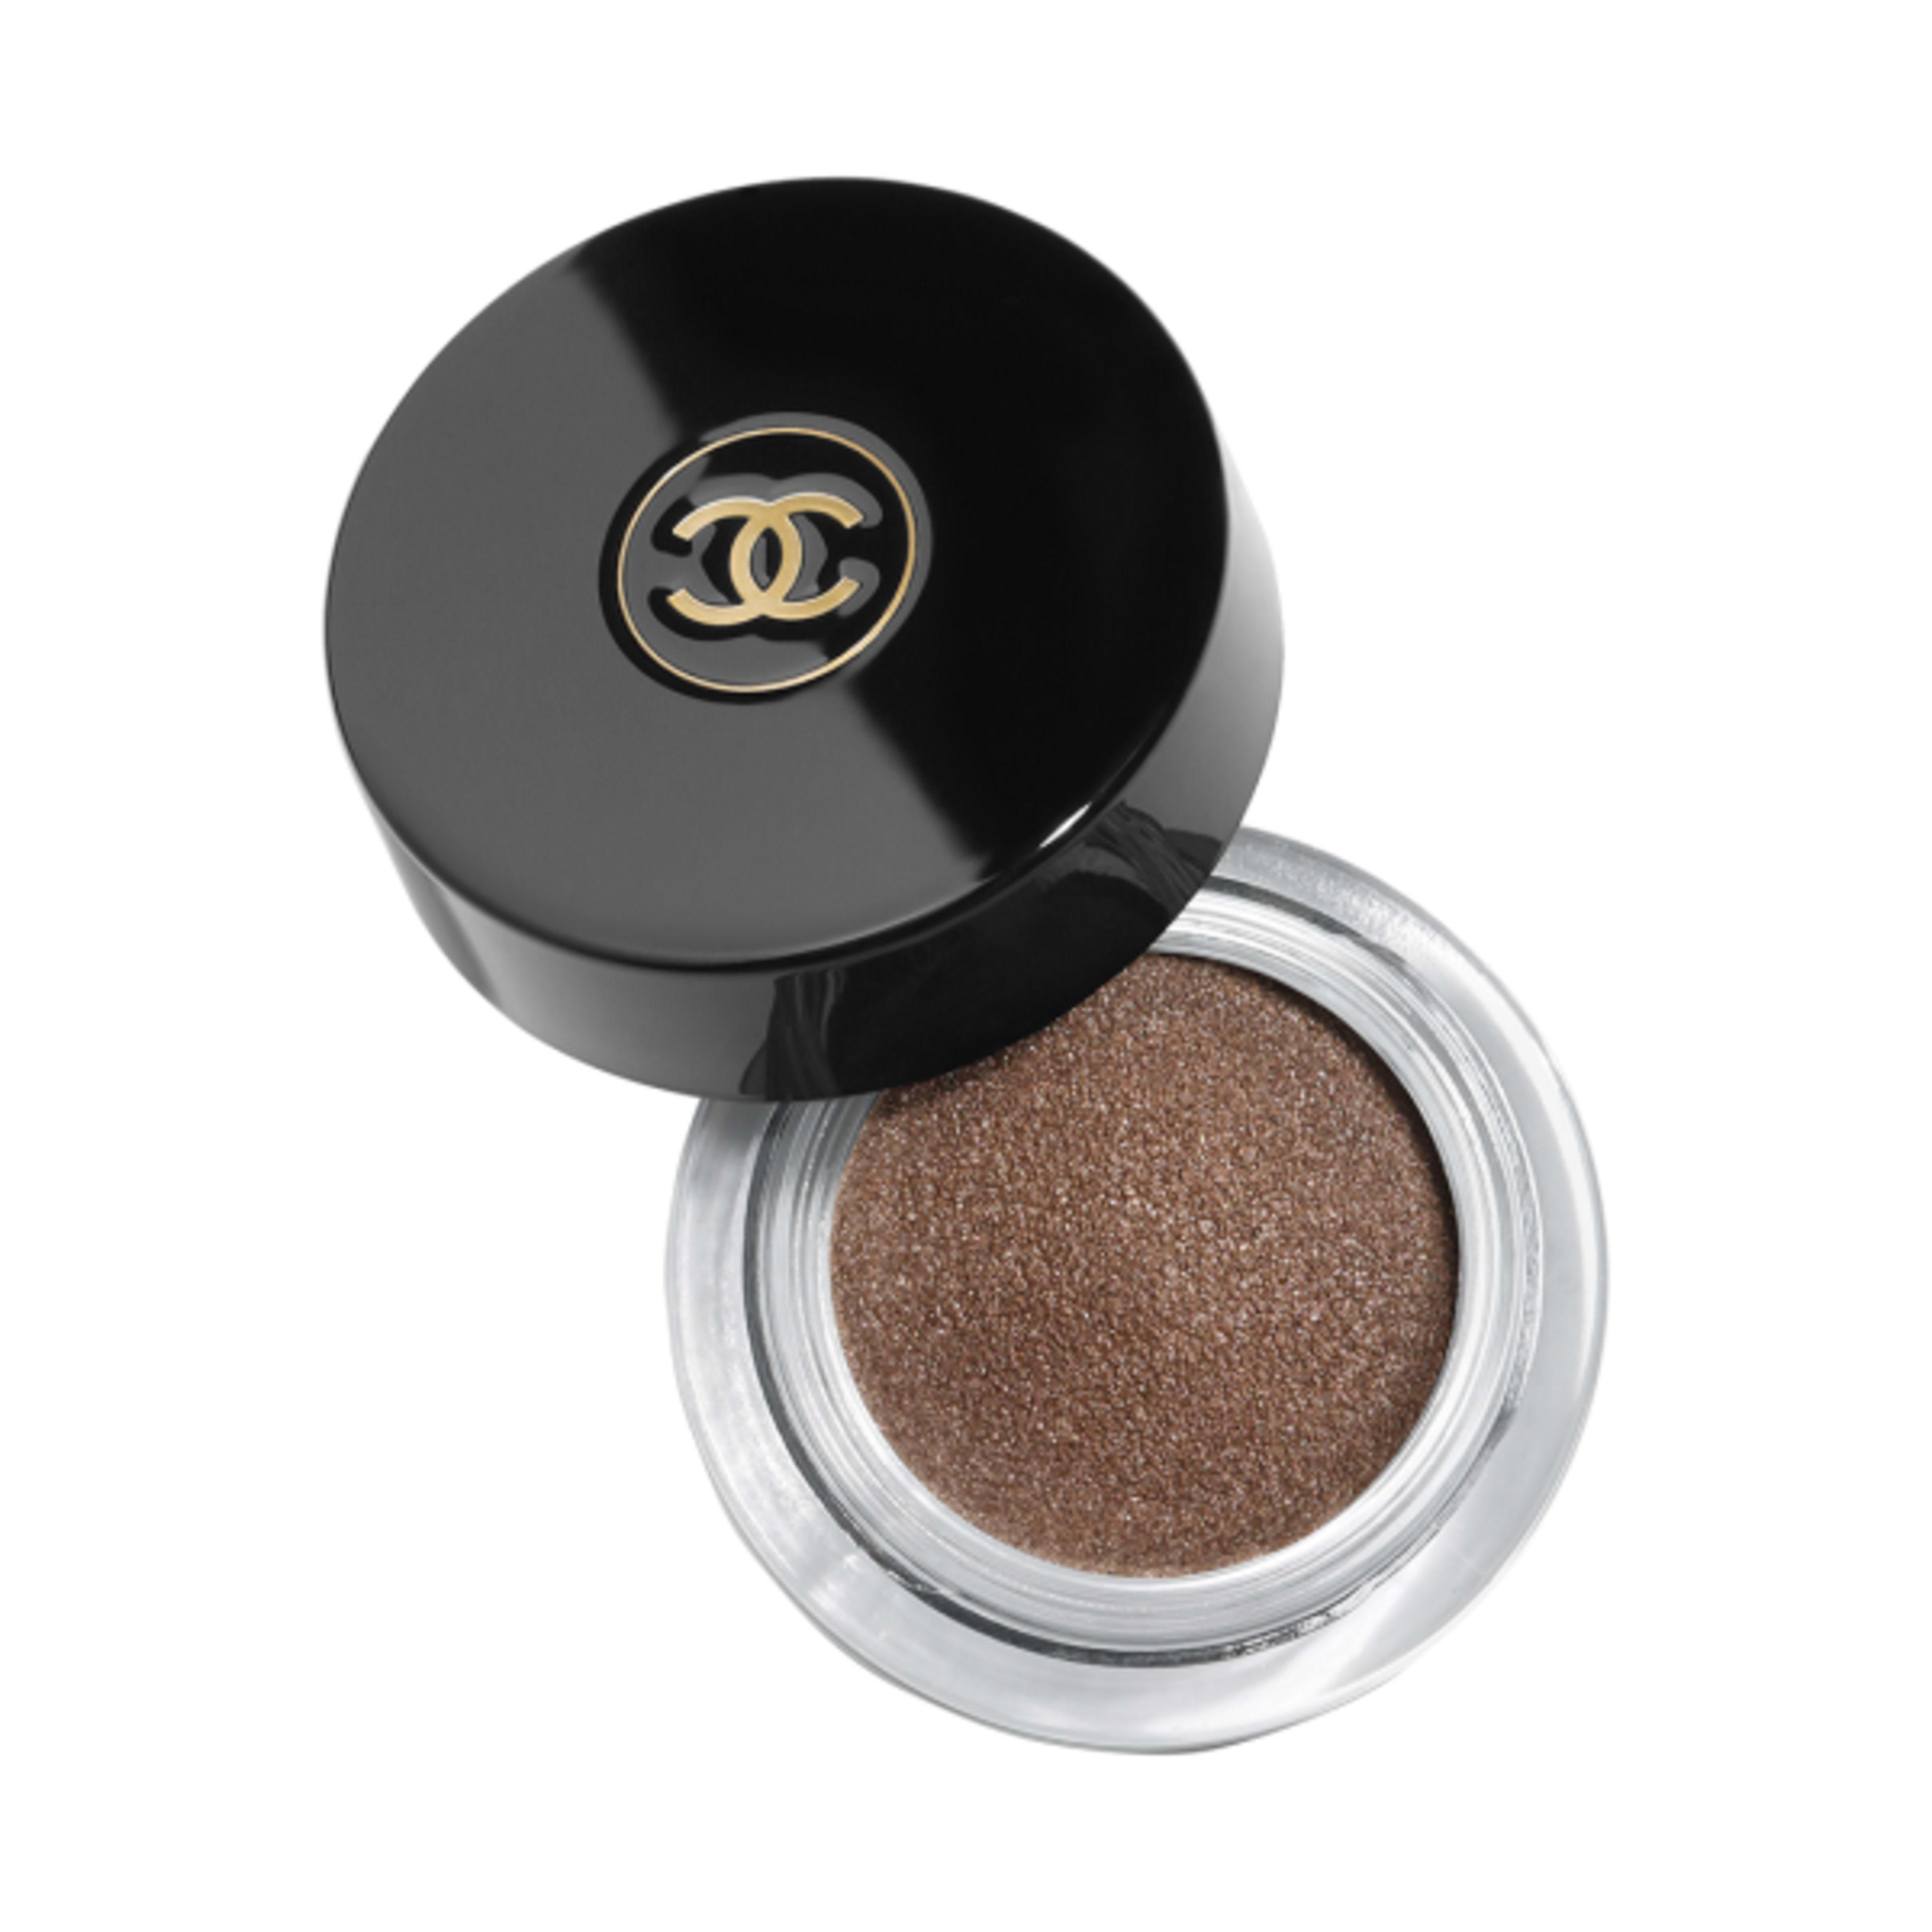 Chanel Ombre Premiere Cream Eyeshadow Patine Bronze 840